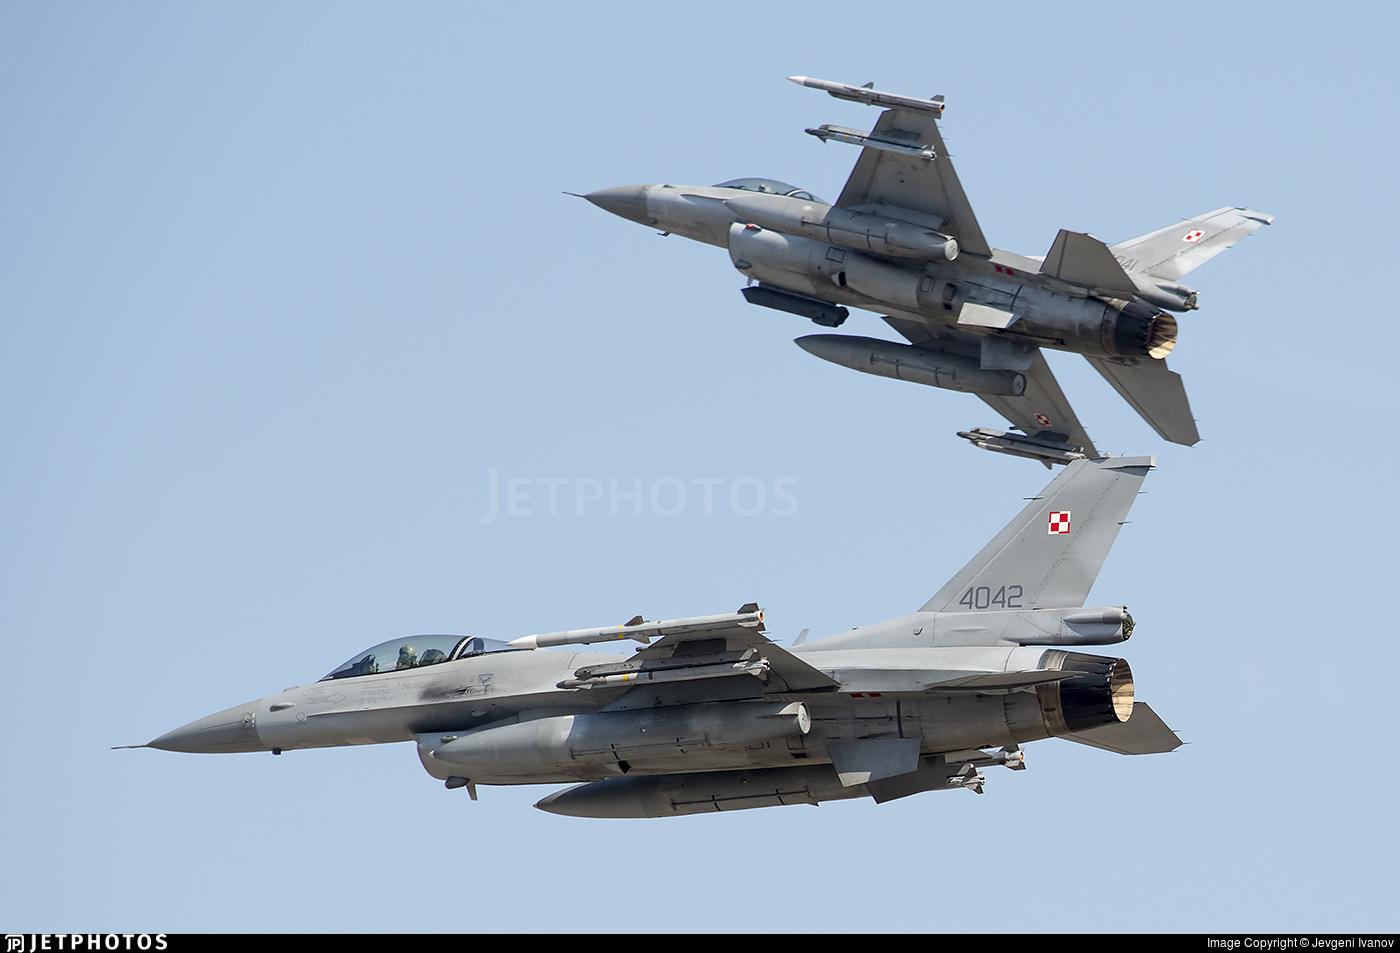 4042 - Lockheed Martin F-16C Fighting Falcon - Poland - Air Force